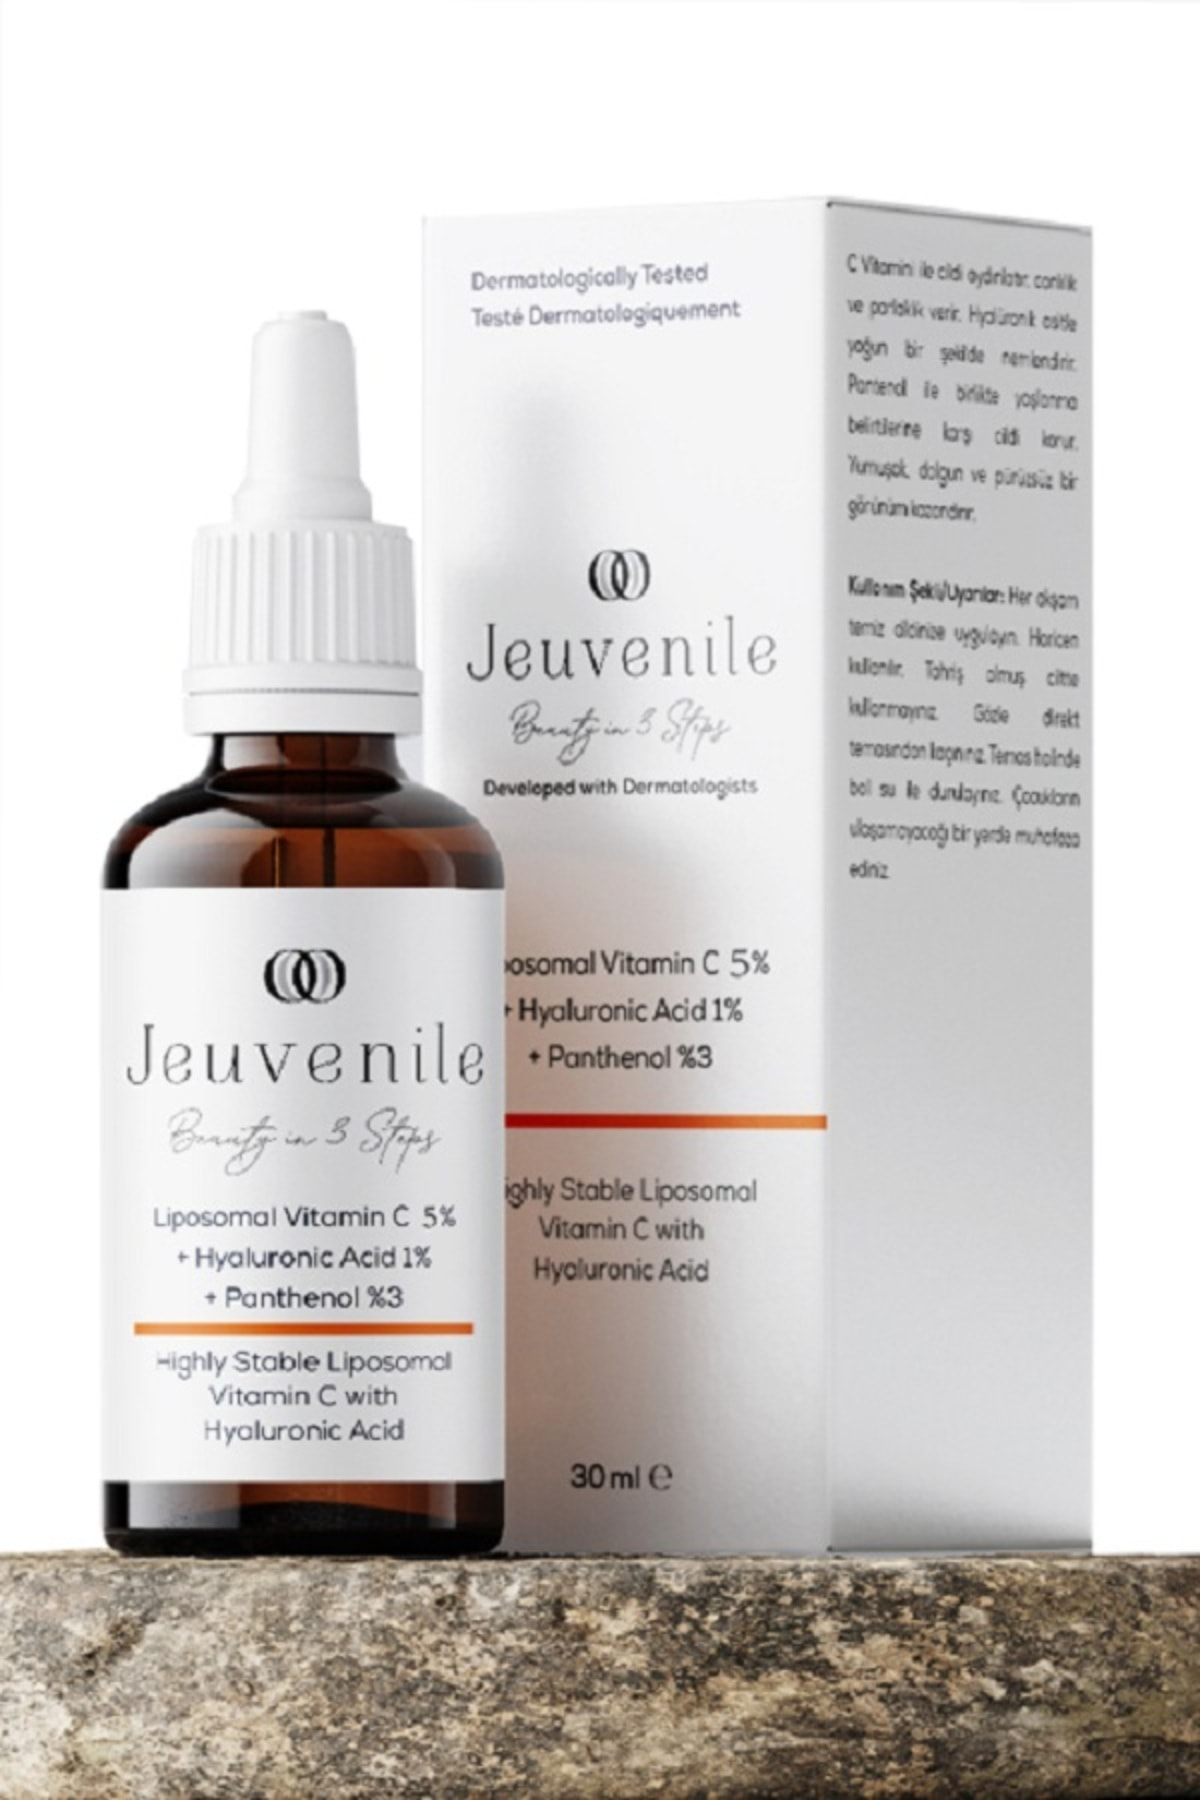 Jeuvenile Liposomal Vitamin C %5 + Hyaluronic Acid %1 + Panthenol %3 C Vitamini Serumu 30 Ml 1